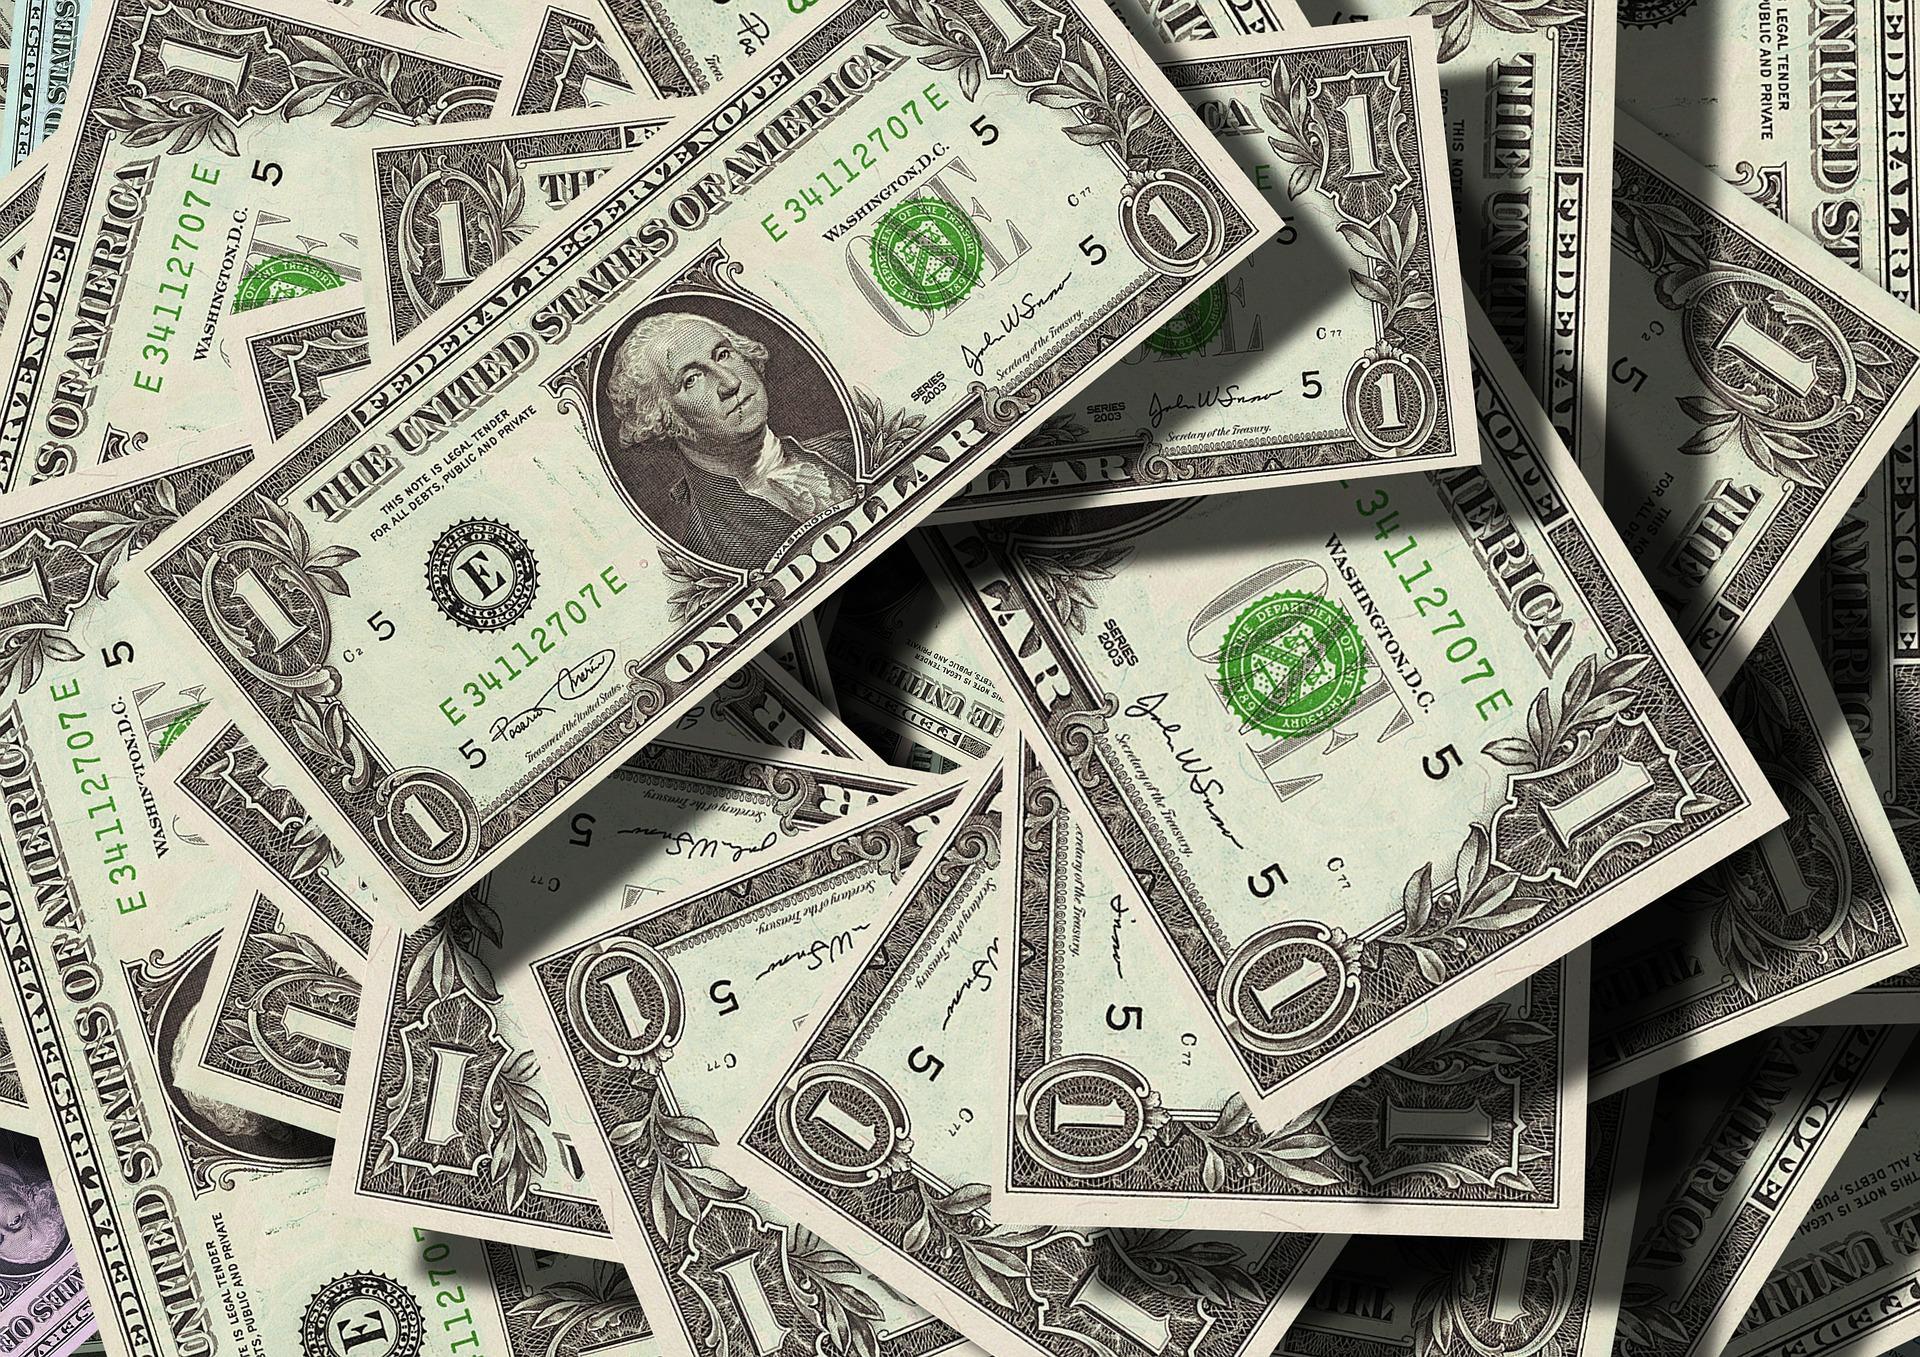 A screen showing money.